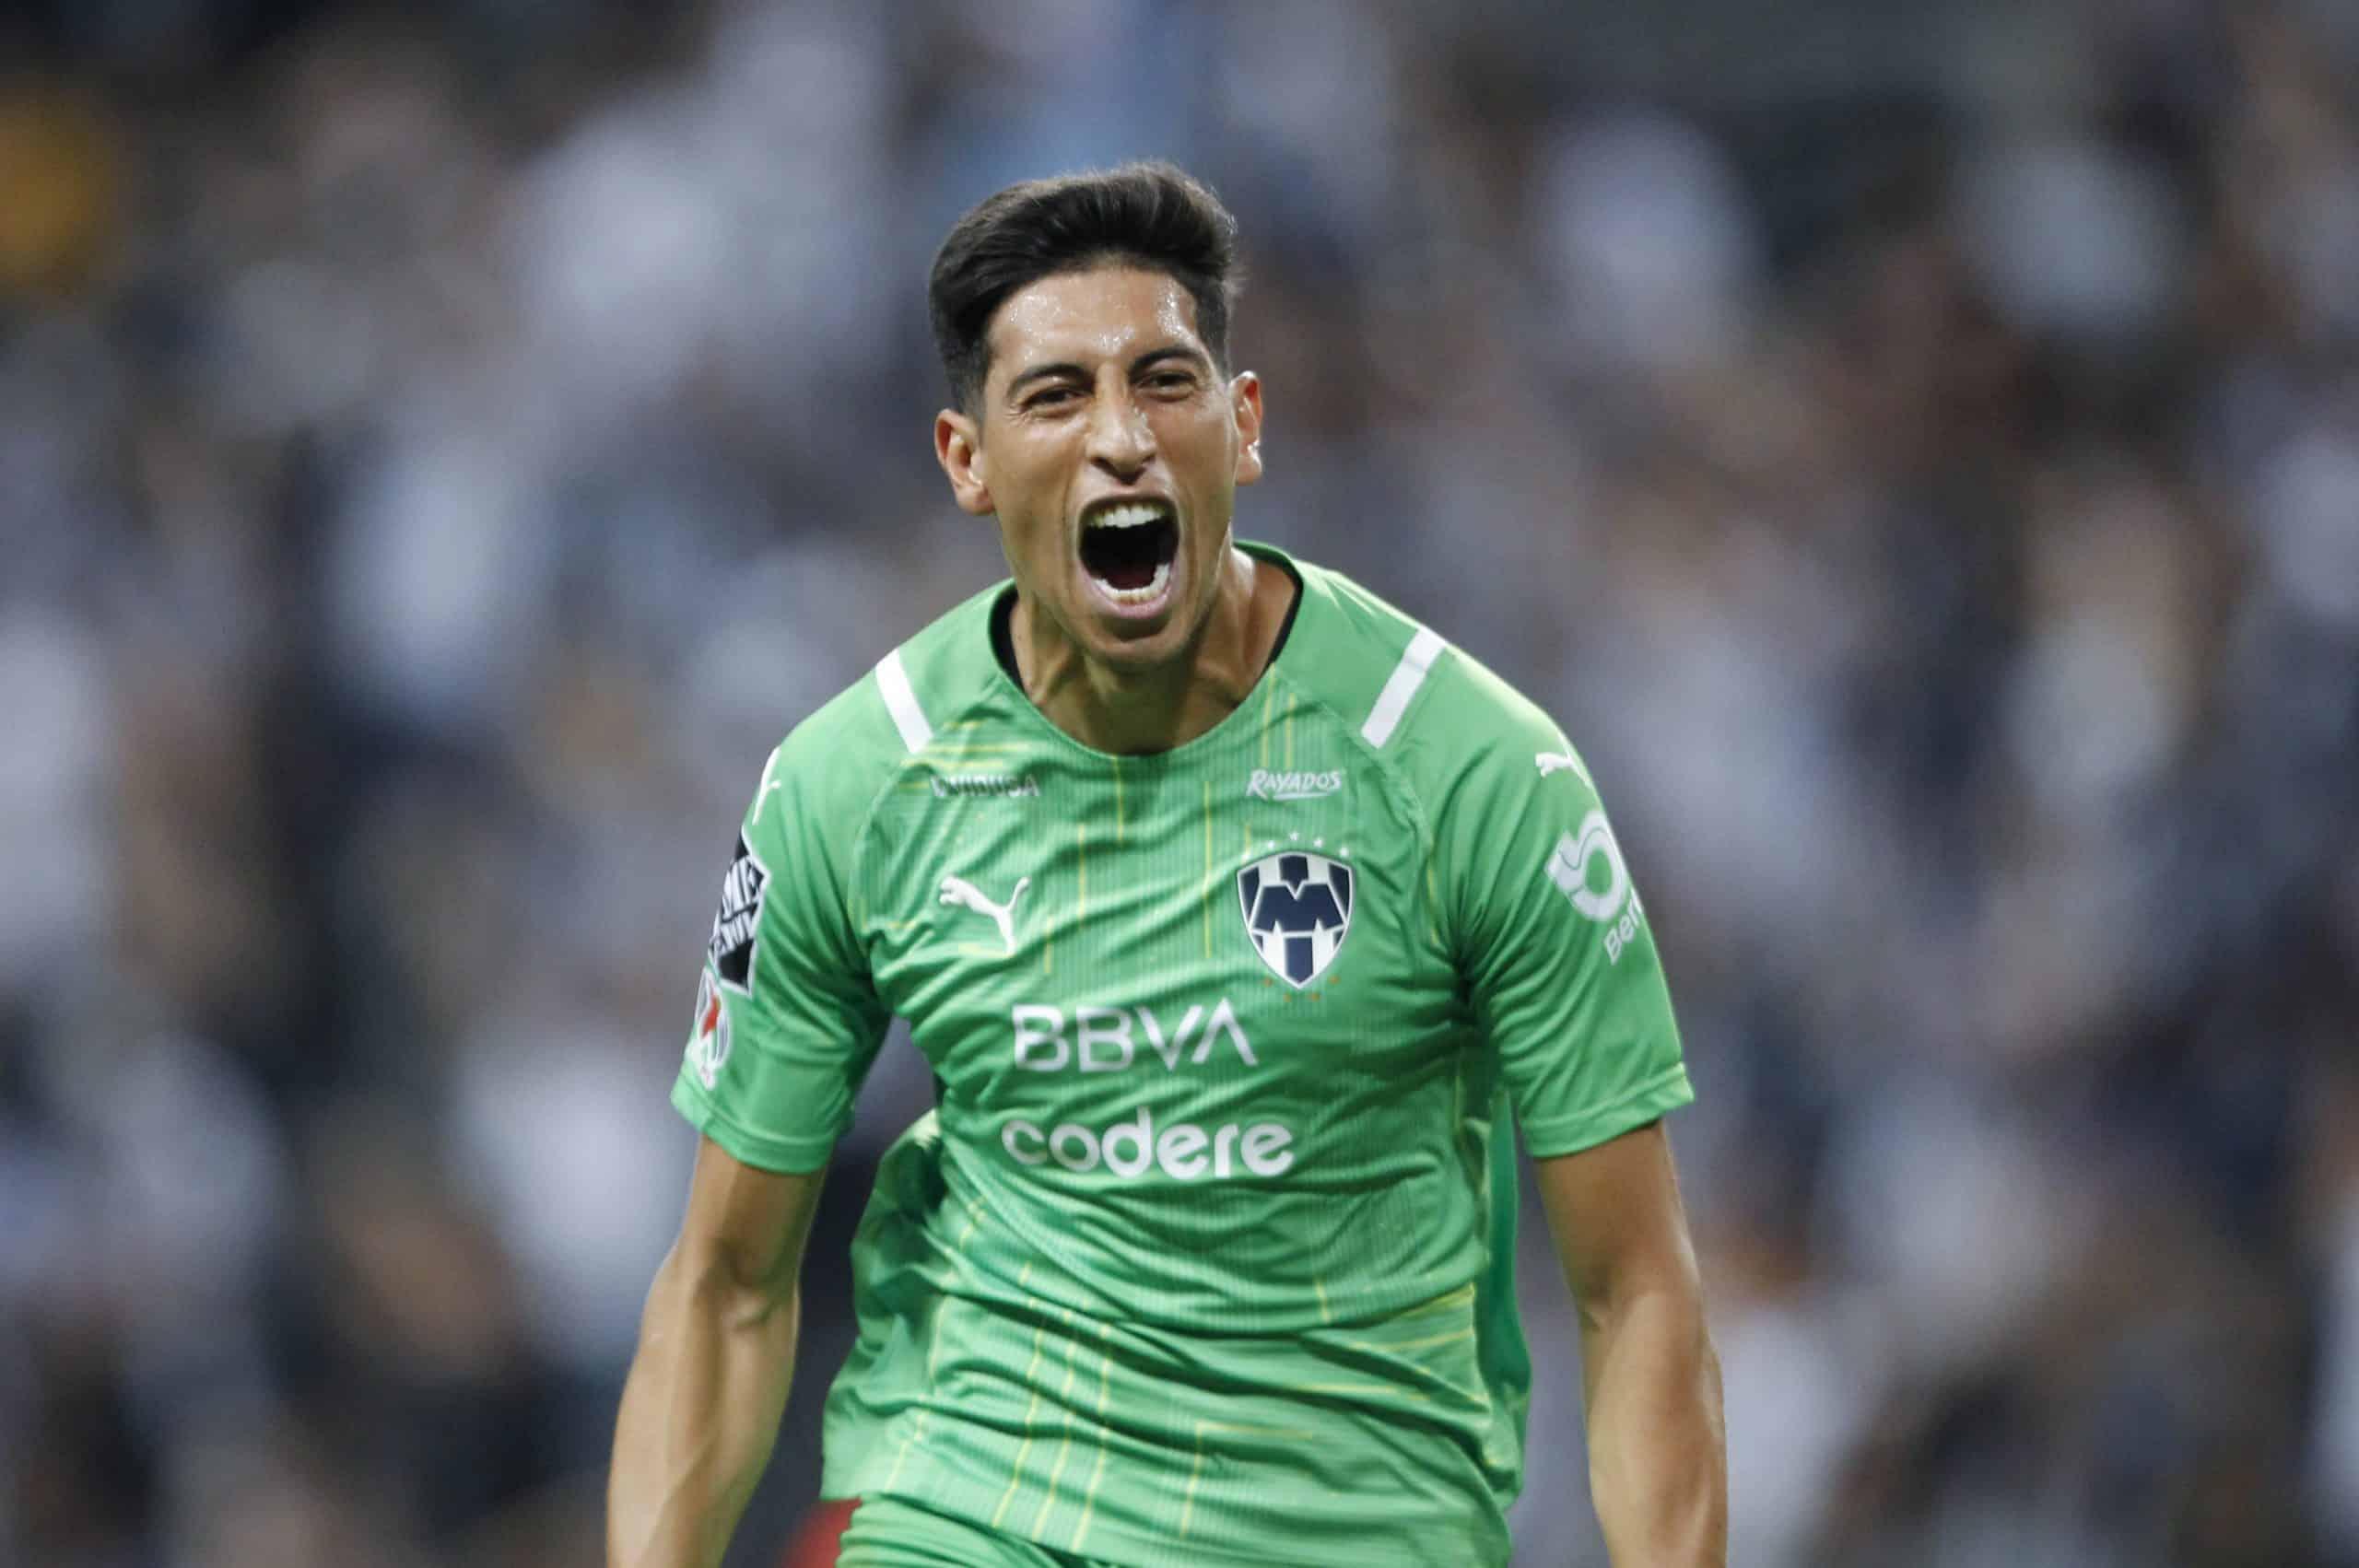 Esteban Andrada vuelve a la Selección de Argentina